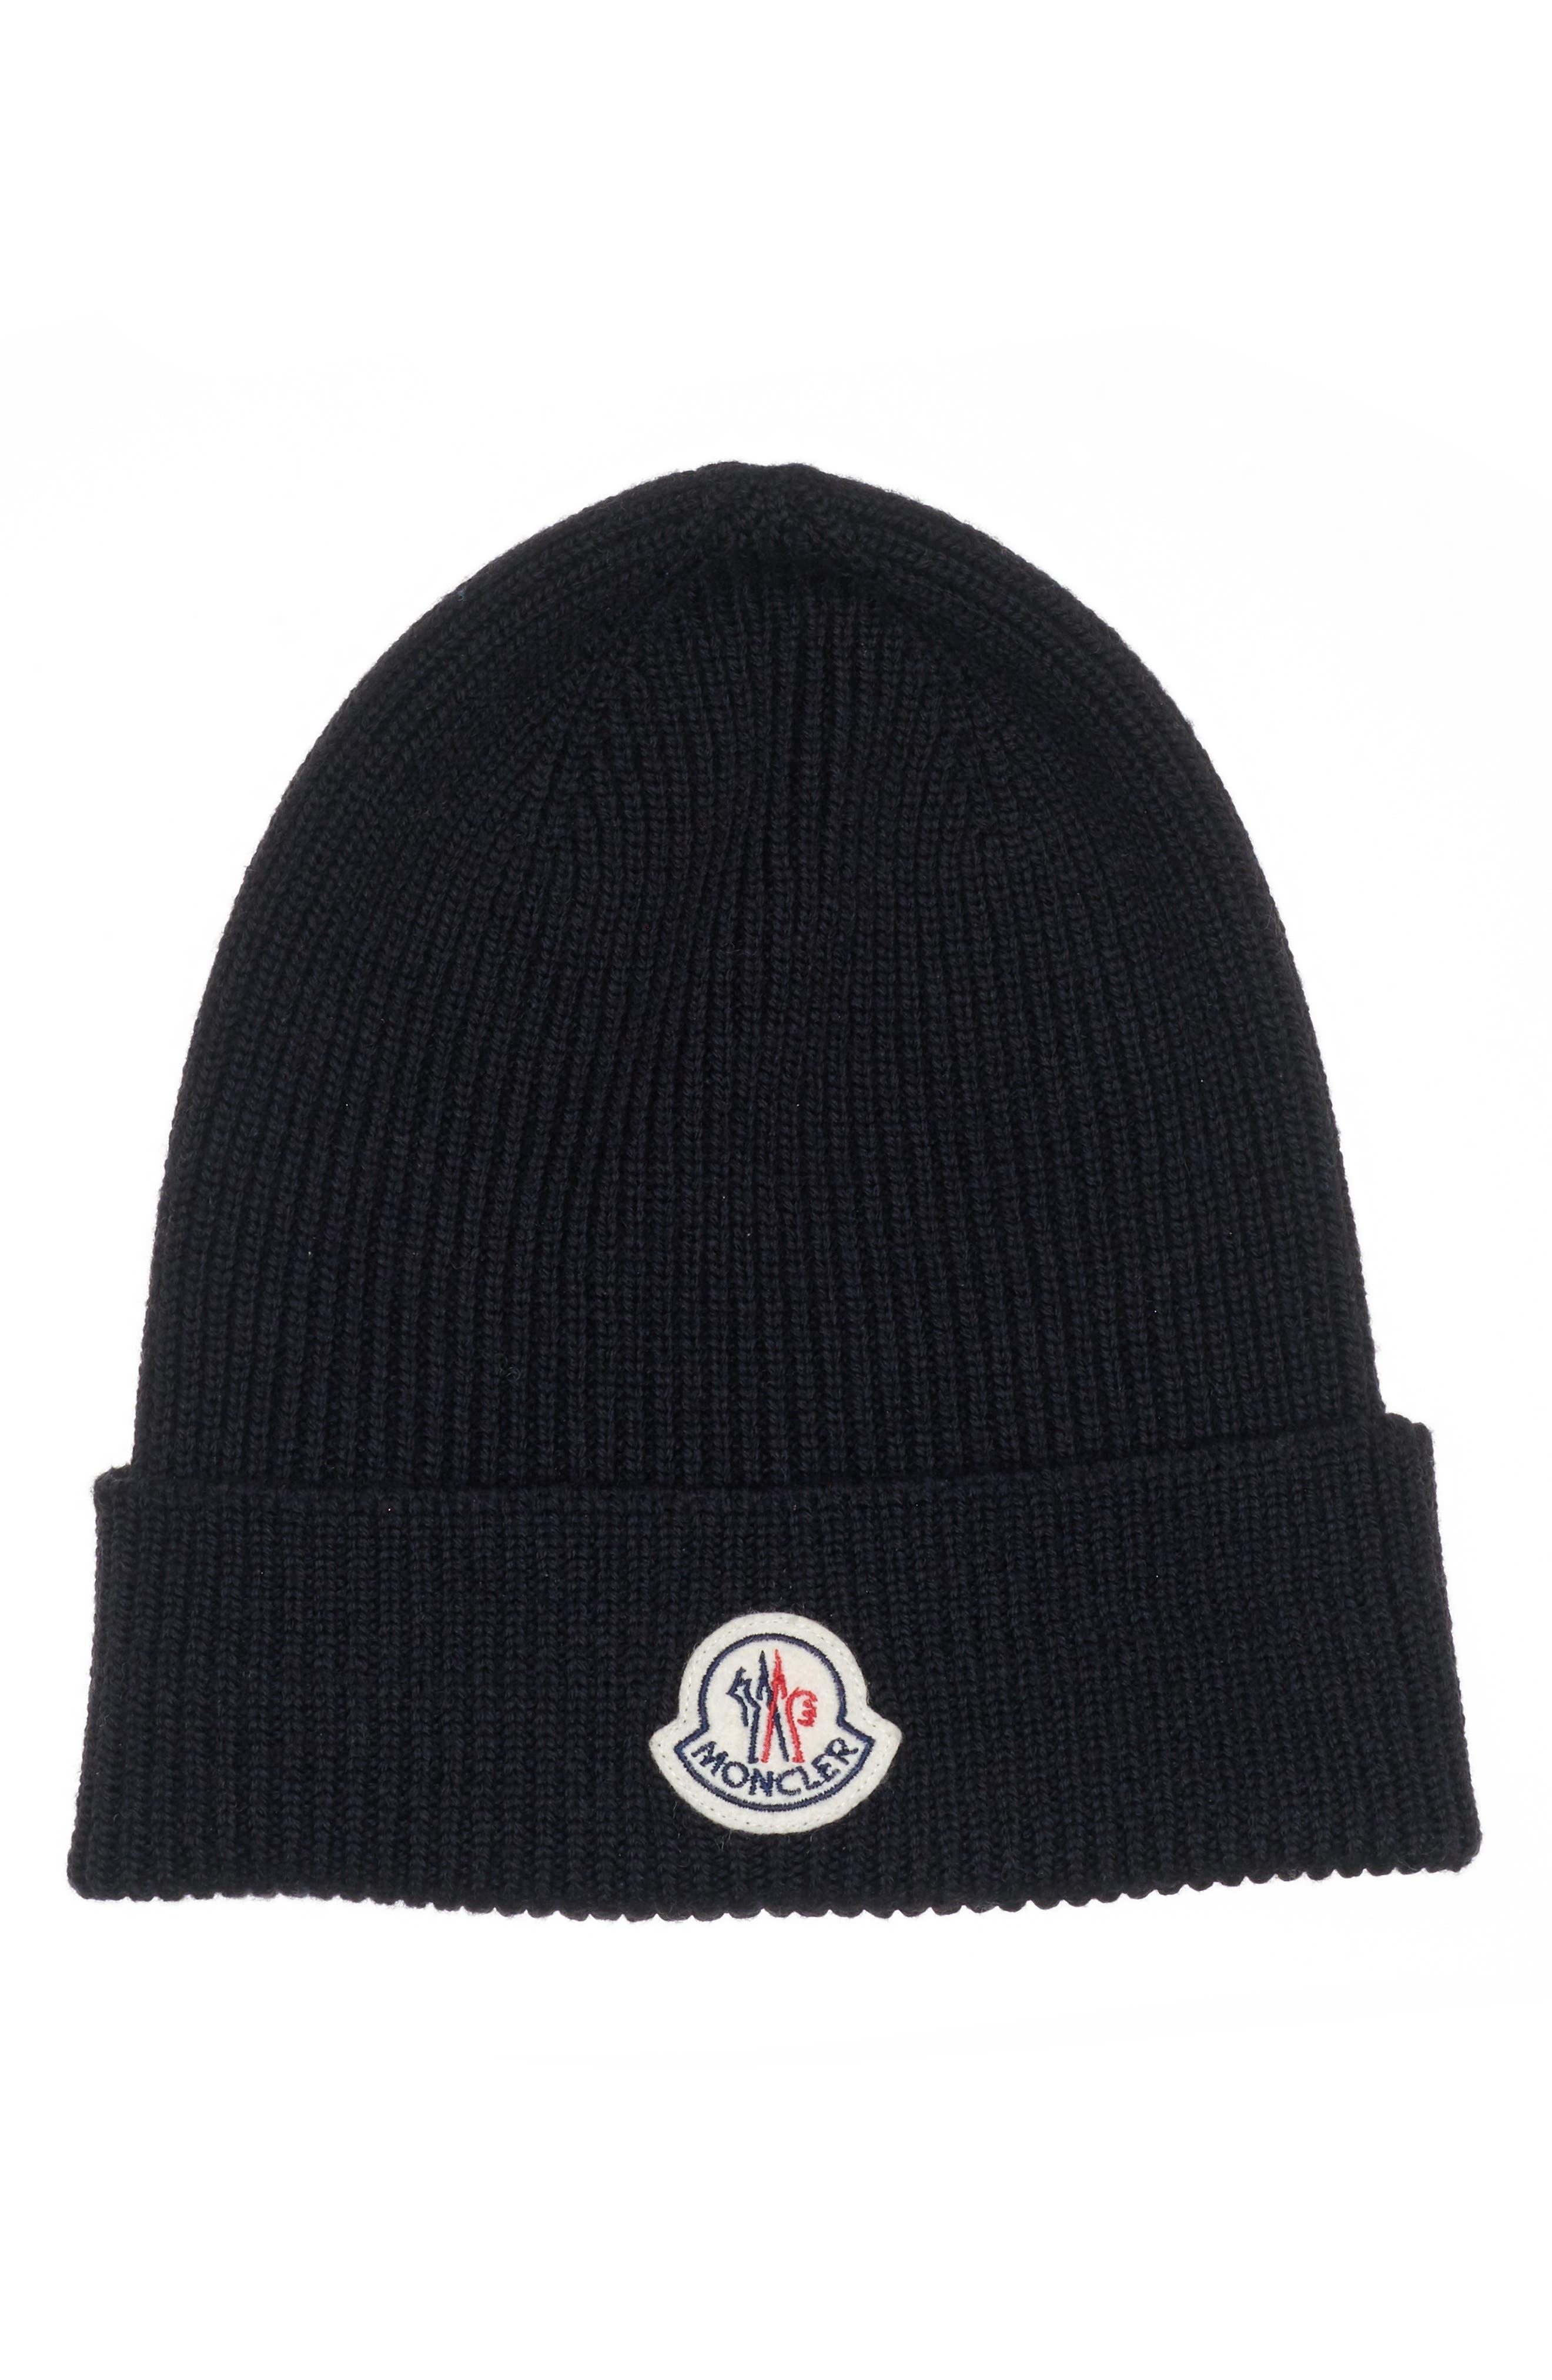 6393a12c Men's Hats, Hats for Men | Nordstrom